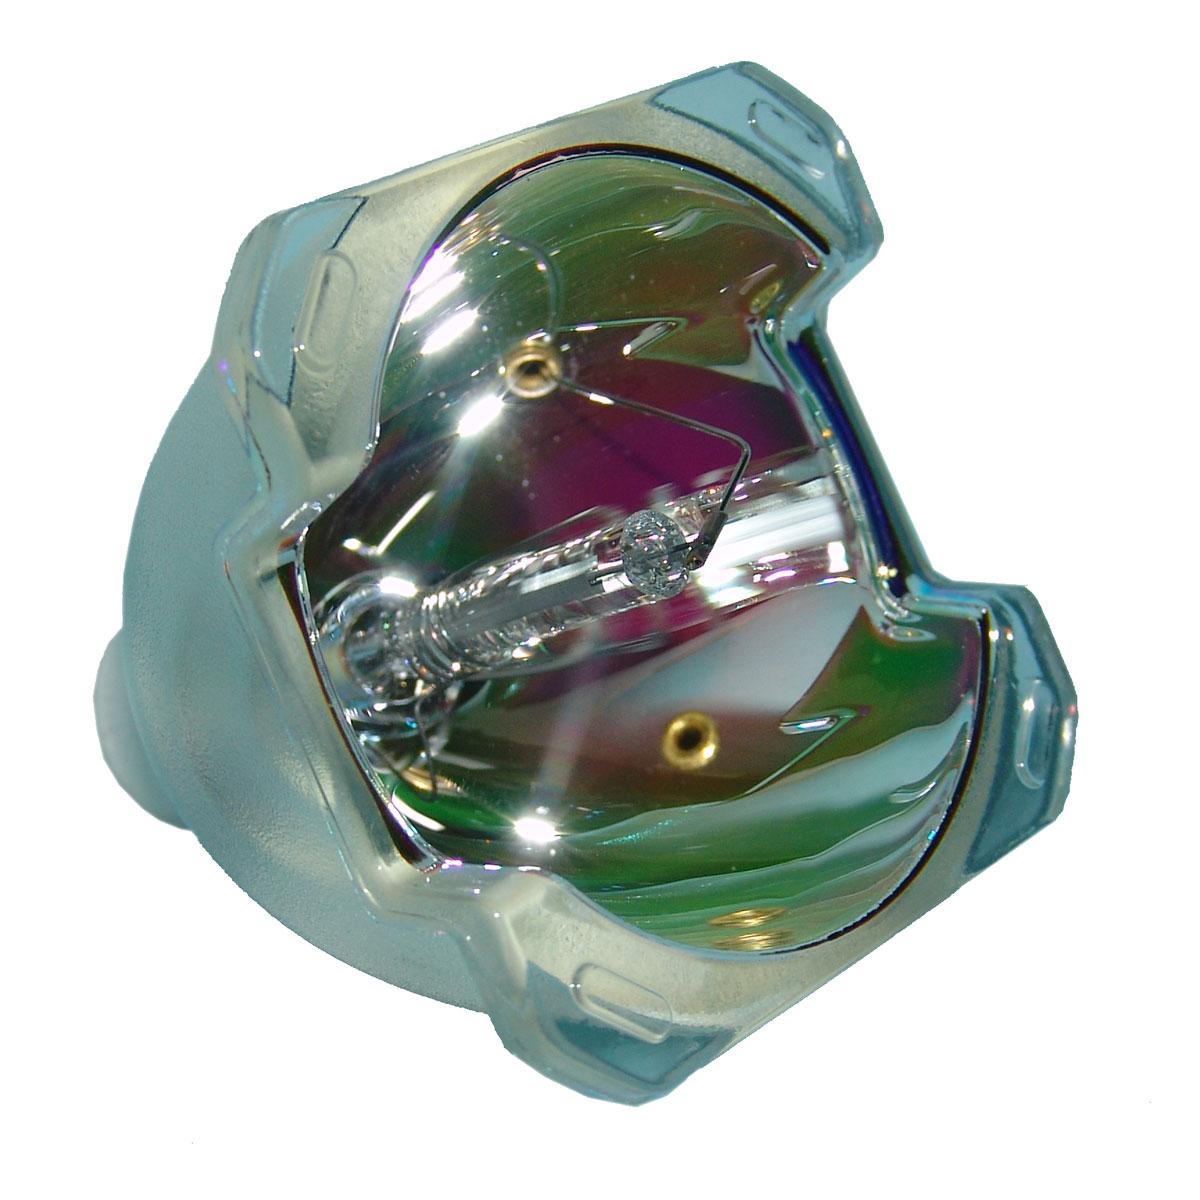 Lutema Platinum Bulb for Runco VideoXtreme VX-2i Projector Lamp (Original Philips Inside) - image 3 of 5